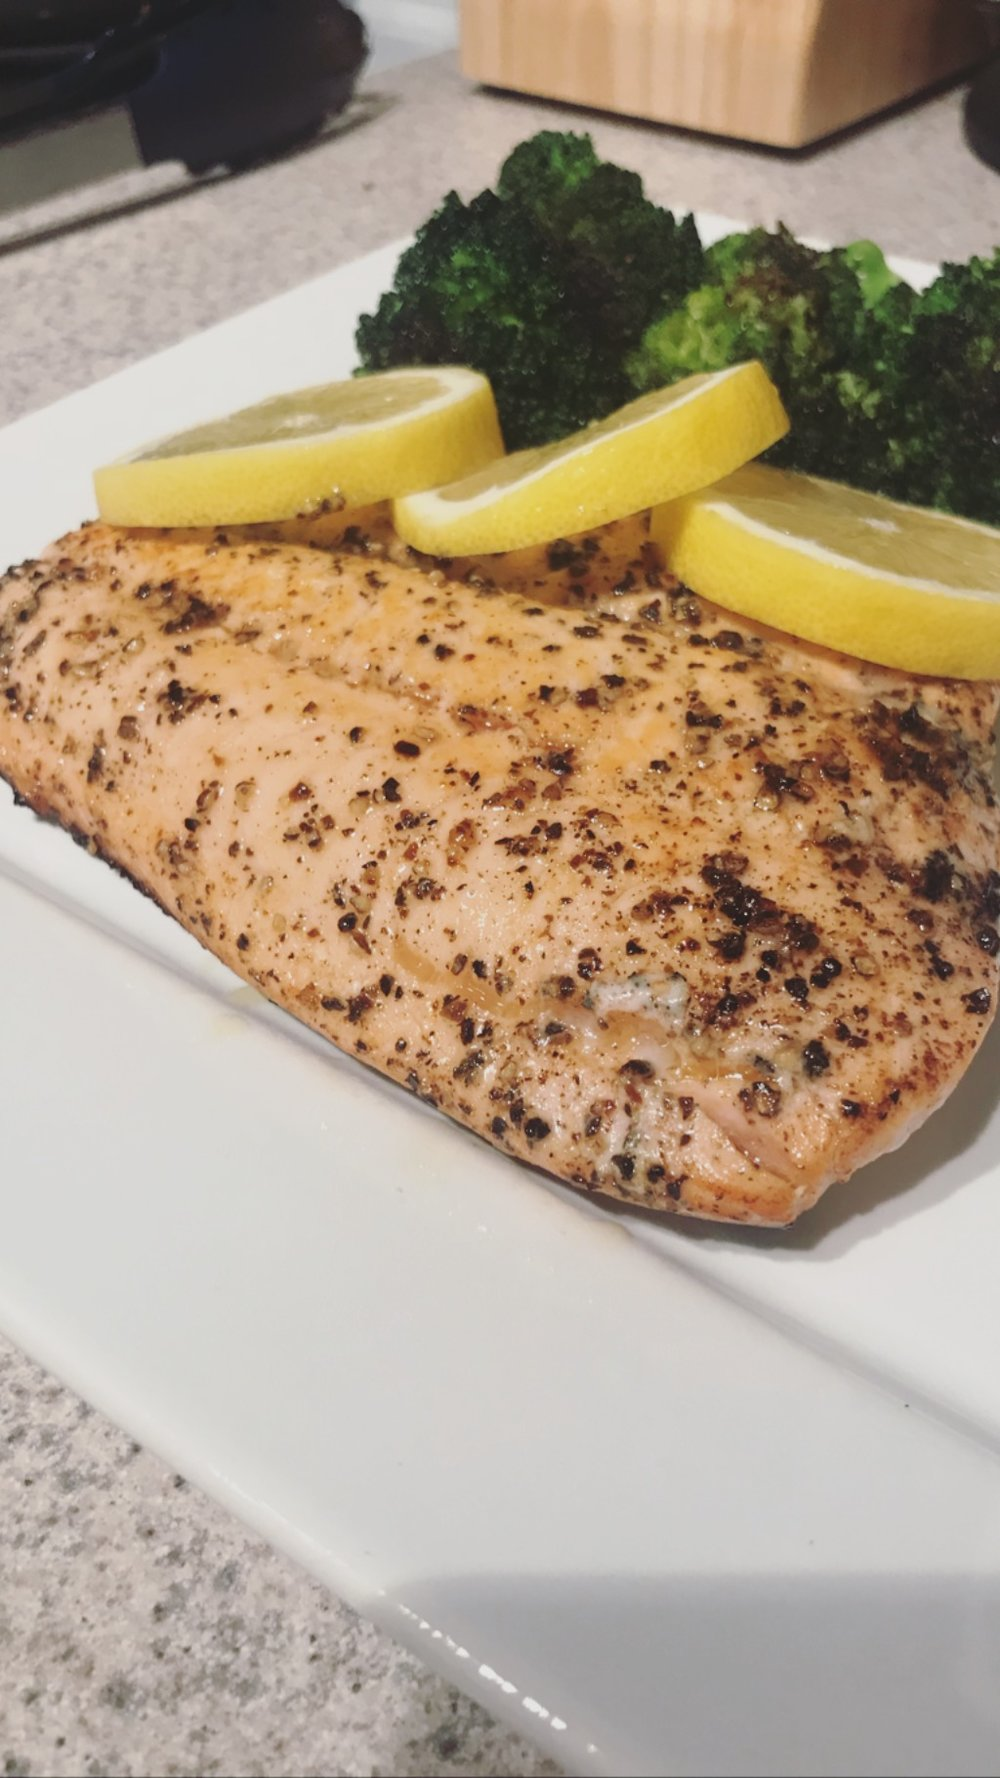 Lemon Pepper Salmon + Broccoli - Monday Night Dinner!